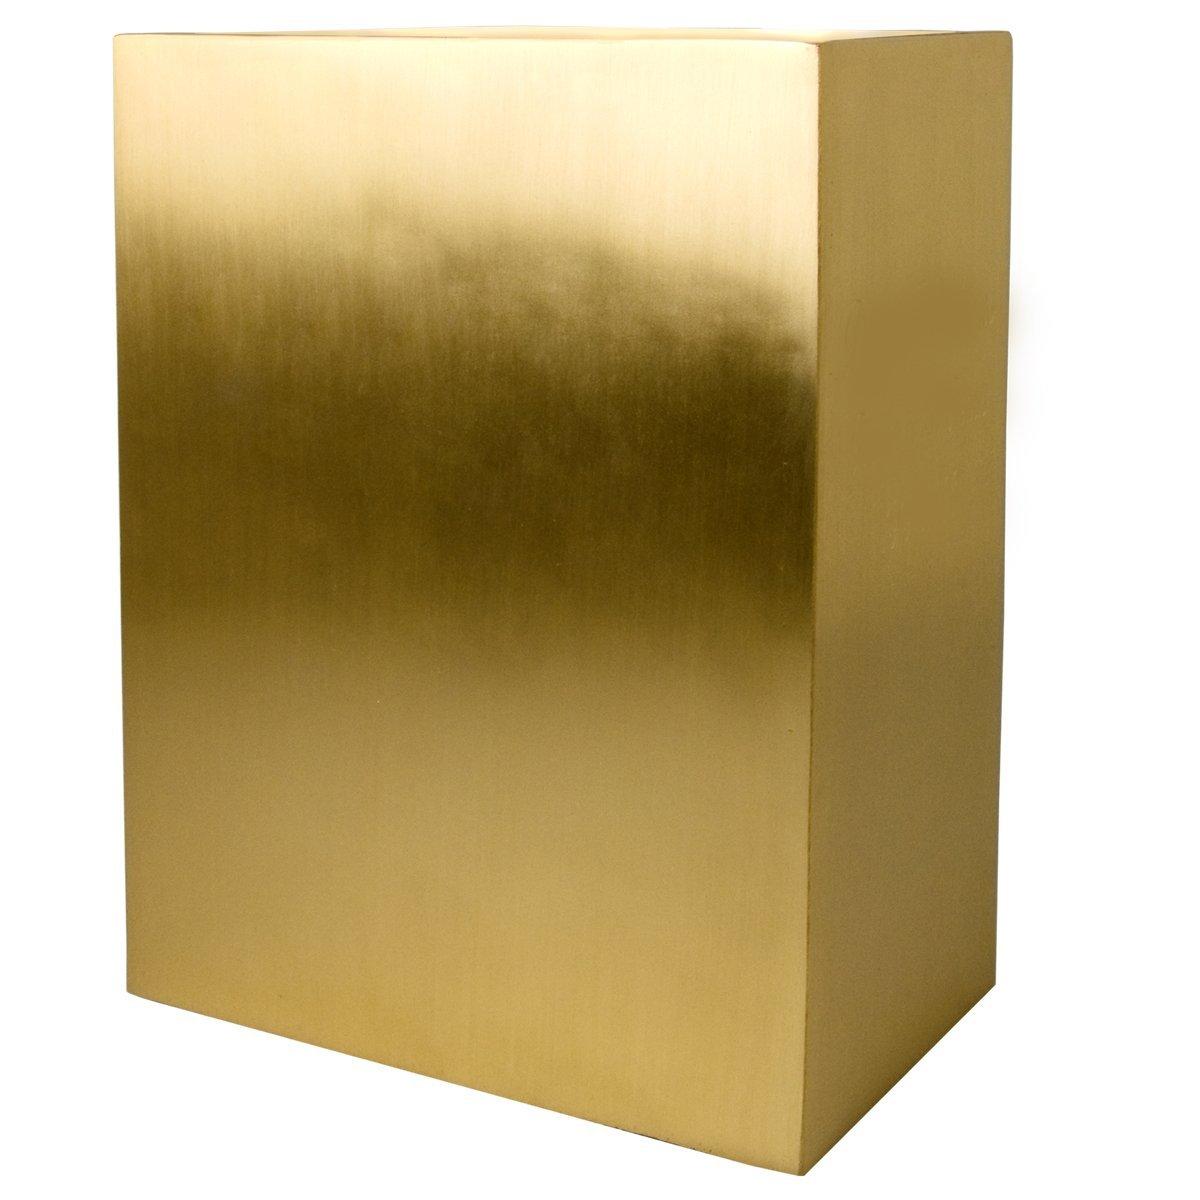 Memorial Gallery Rectangular Cremation Urns, Brushed Brass